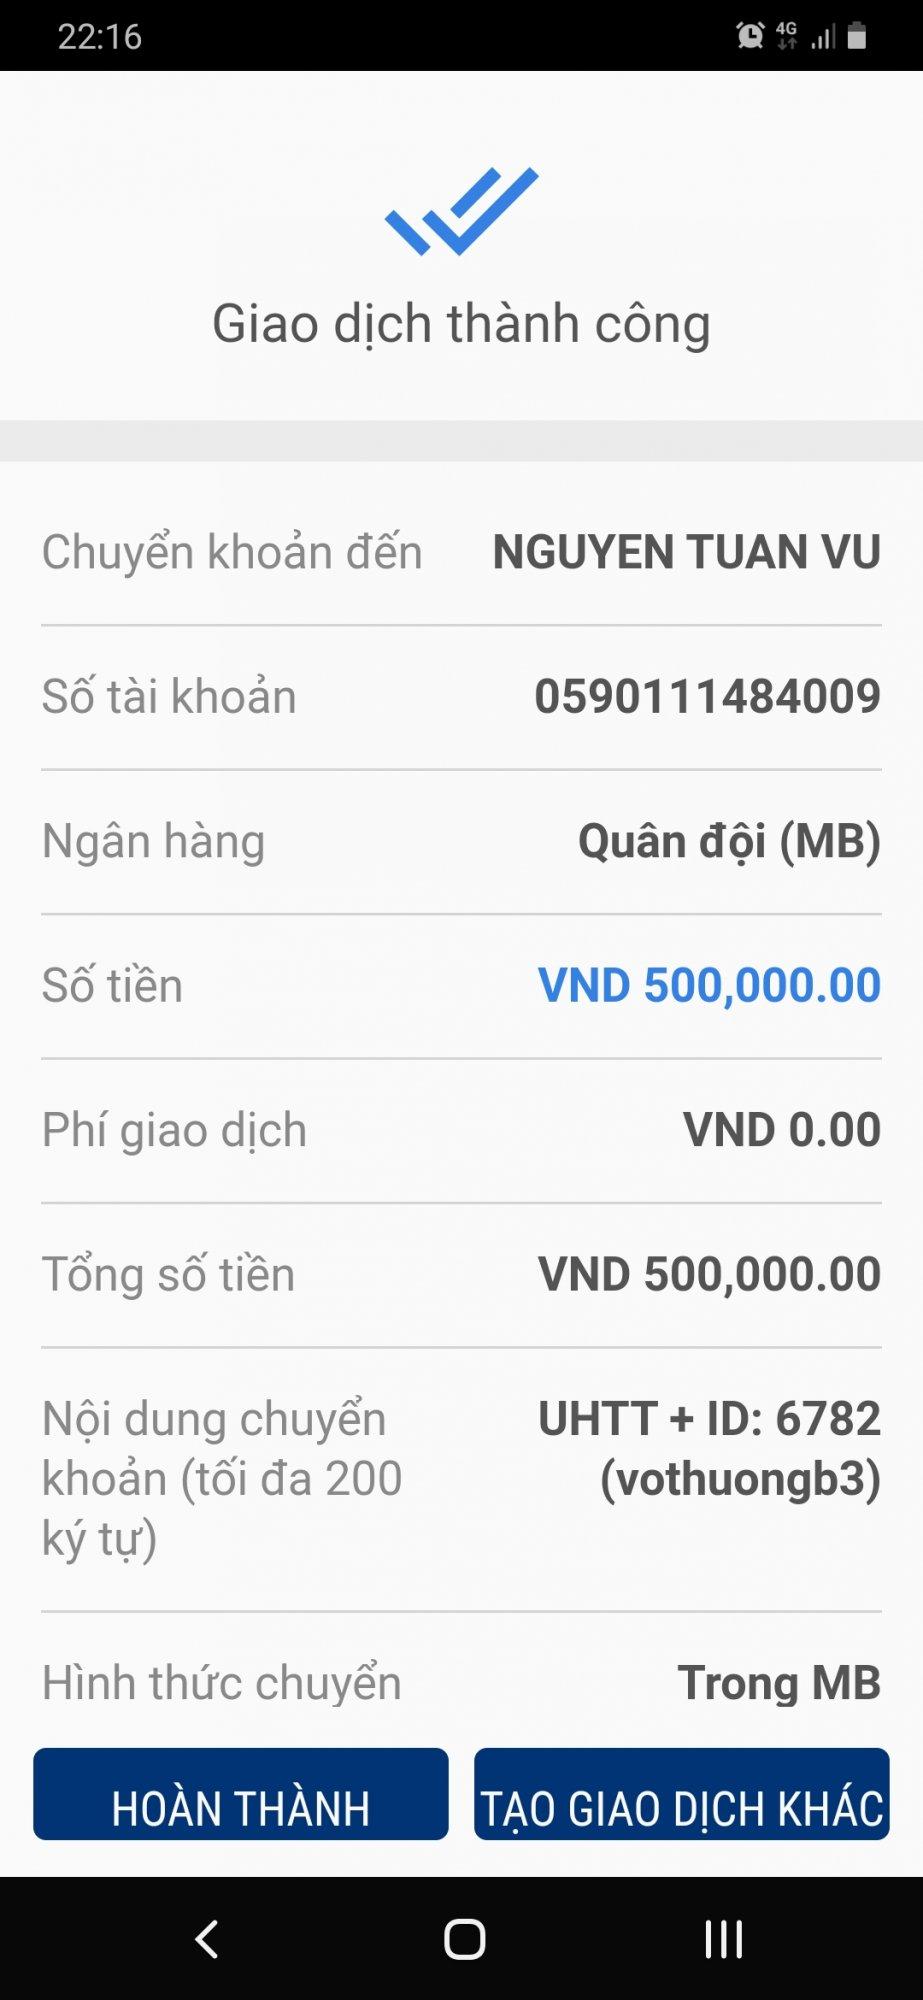 Screenshot_20191205-221621_MB Bank.